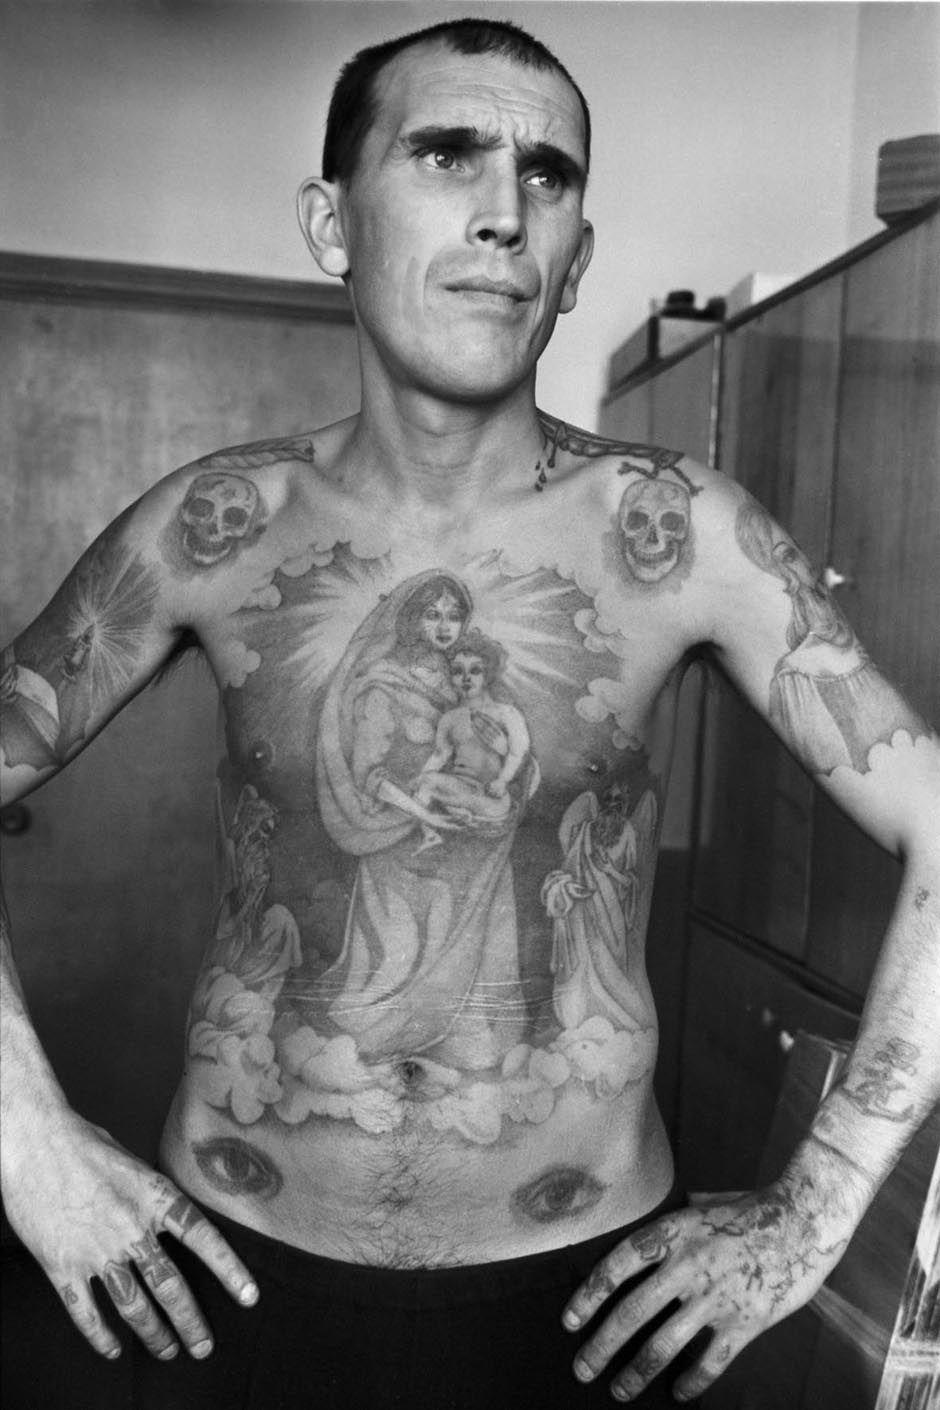 tatouage-encyclopedie-criminel-russe-prison-03.jpg